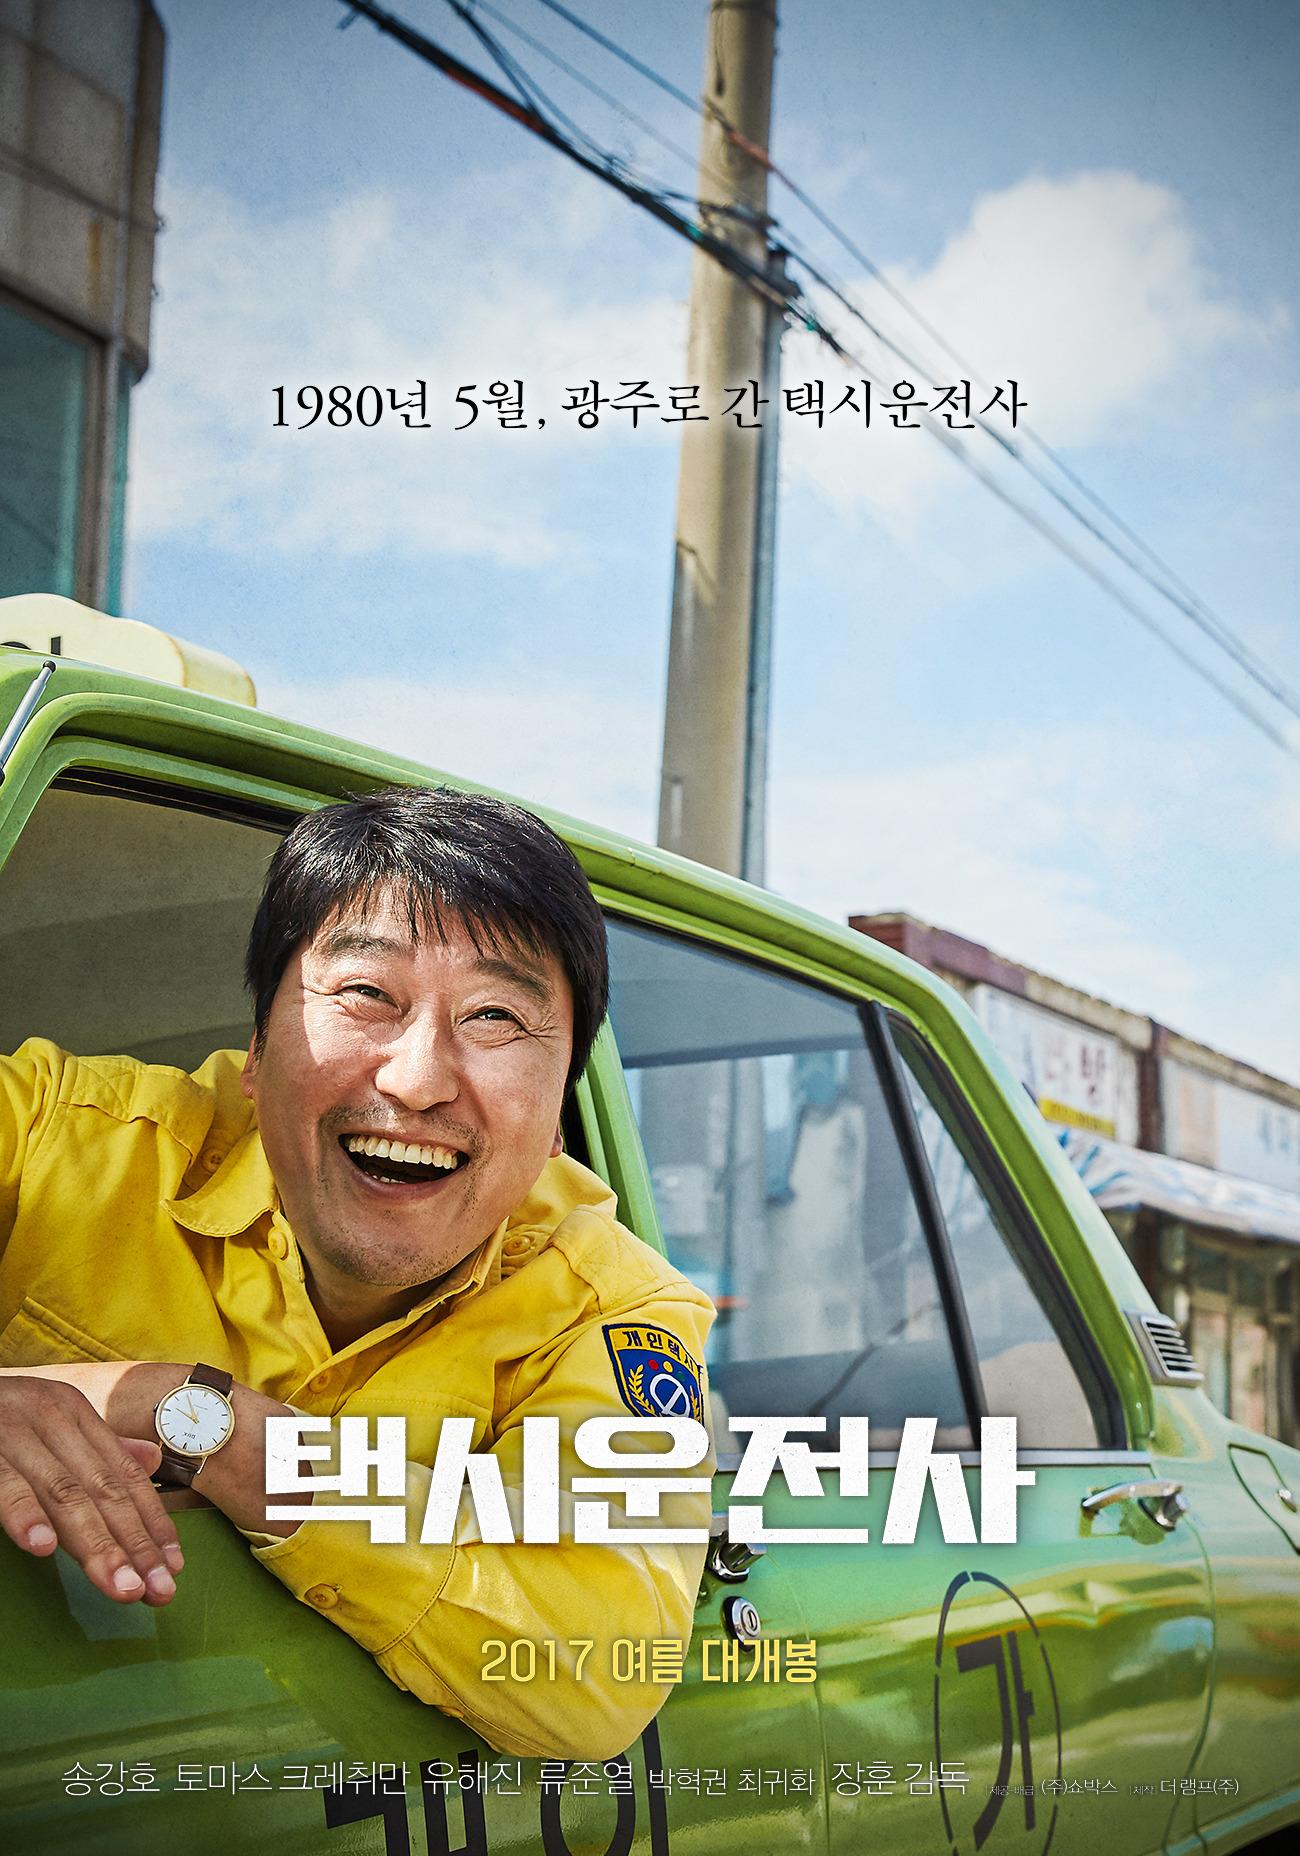 [N1★Dday] '택시운전사', '군함도'와 '티켓 양분' 성공할까?